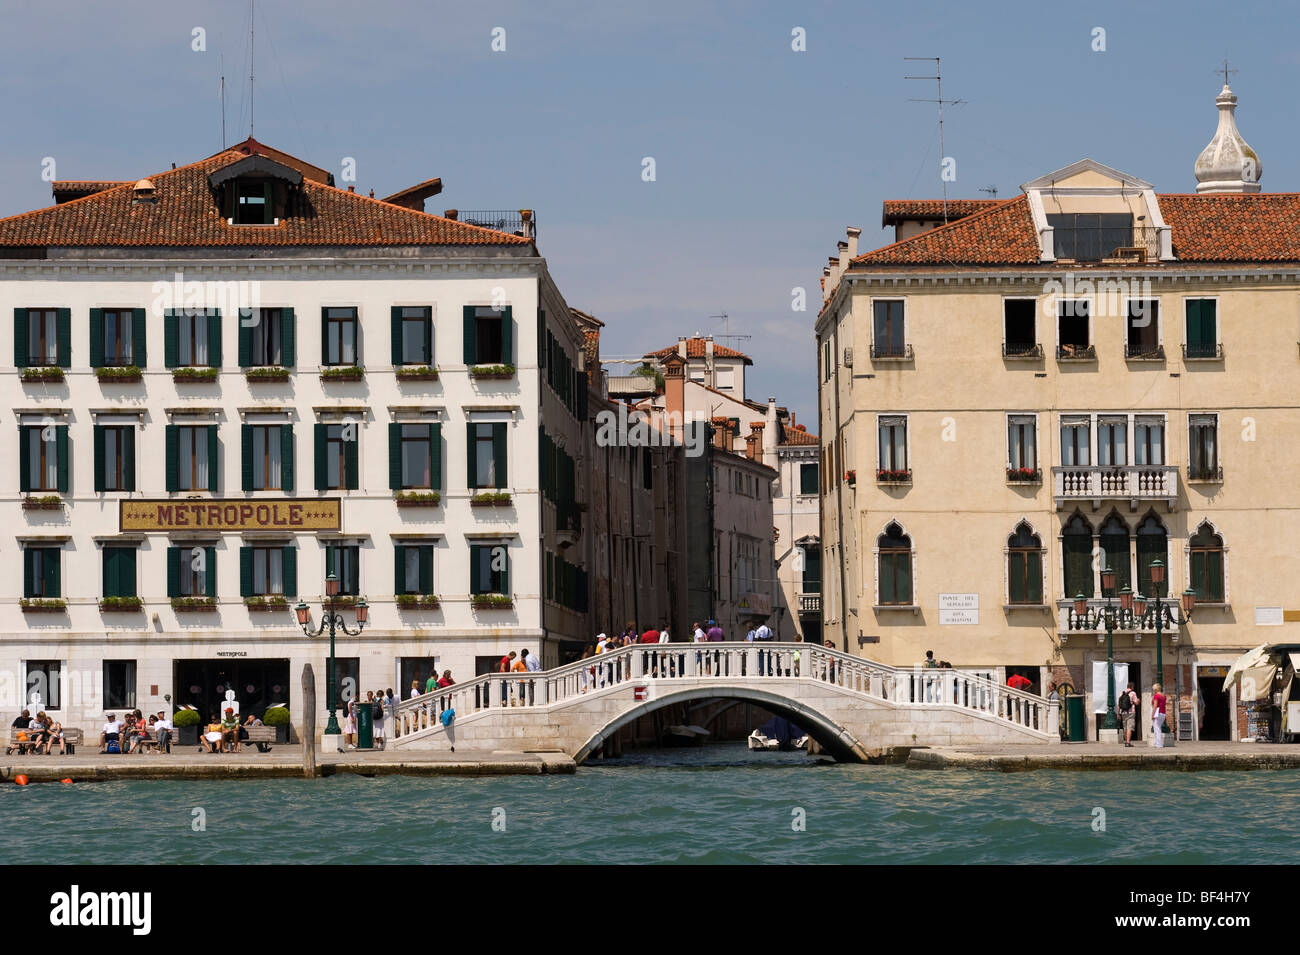 Hotel Metropole, Ponte del Sepolcro, Venedig, Veneto, Italien, Europa Stockbild